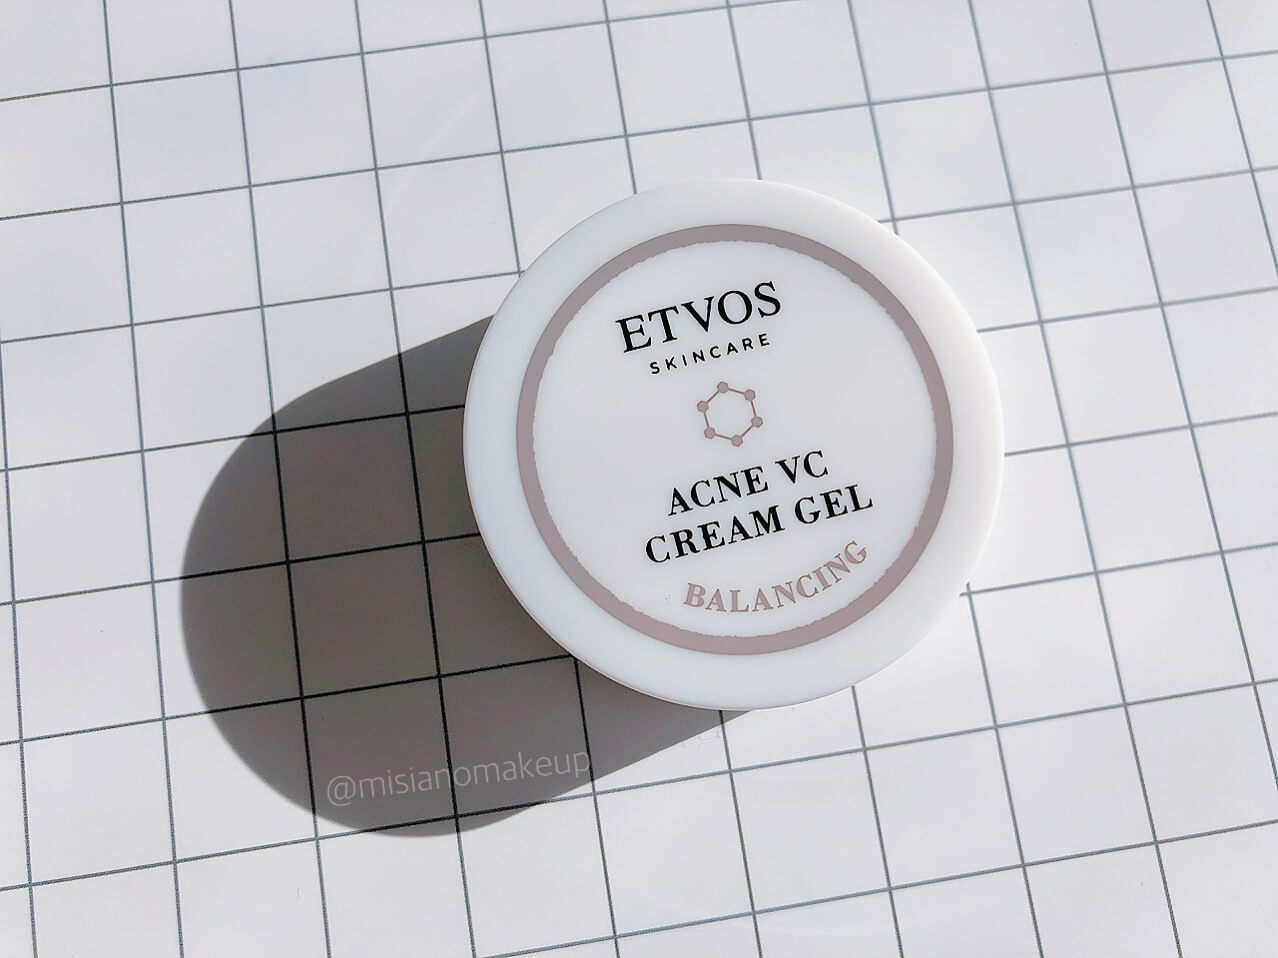 ETVOS「薬用アクネVCクリームジェル」